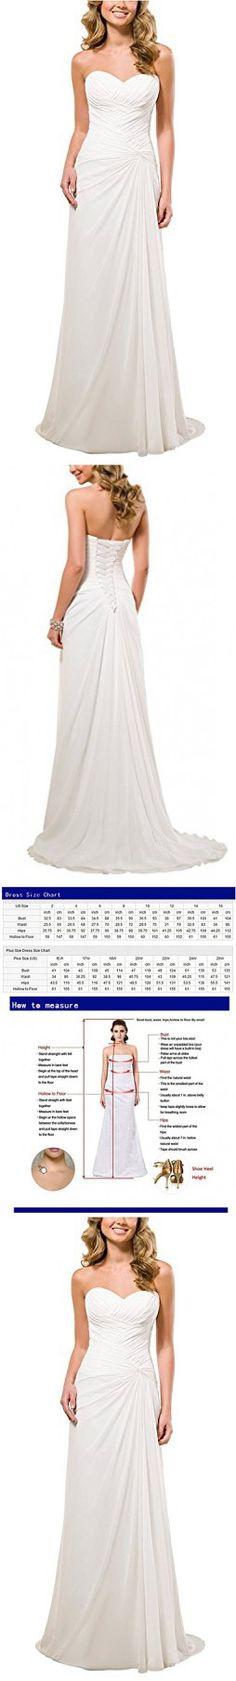 Vivebridal Women's A-Line Chiffon with Pleat Lace Up Beach Wedding Dress White 6